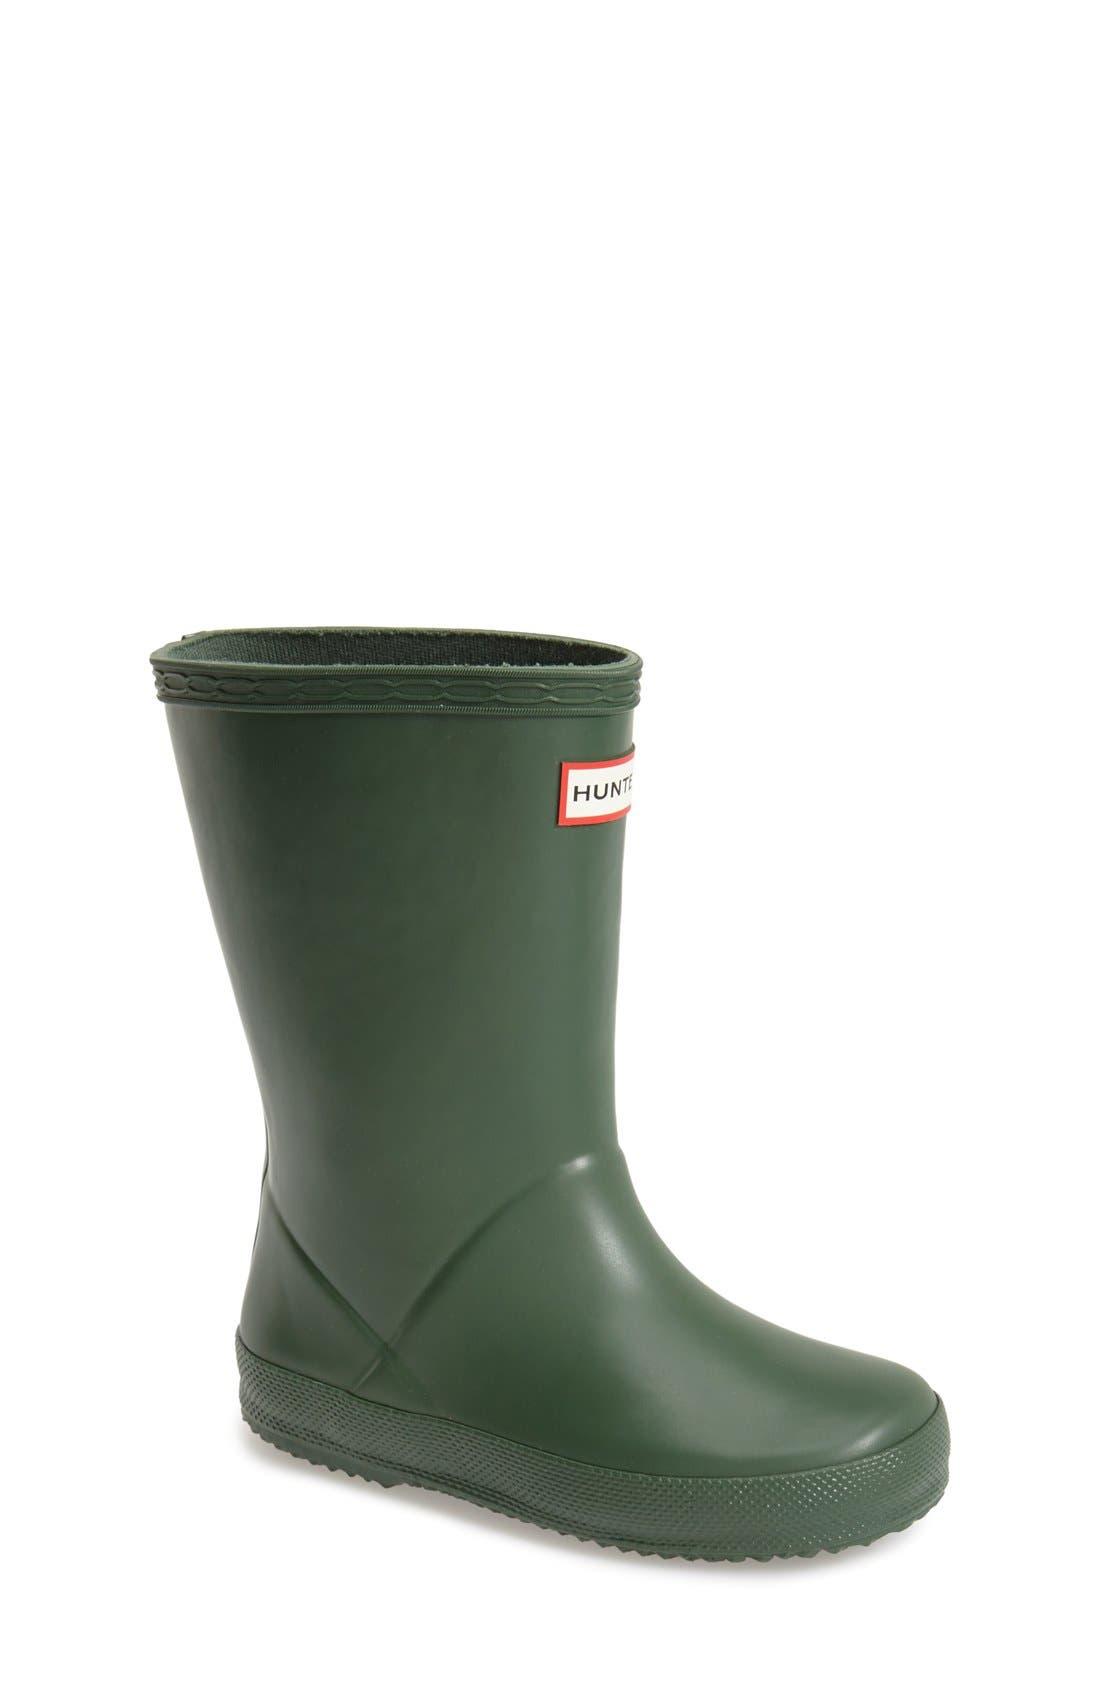 HUNTER, First Classic Waterproof Rain Boot, Main thumbnail 1, color, HUNTER GREEN